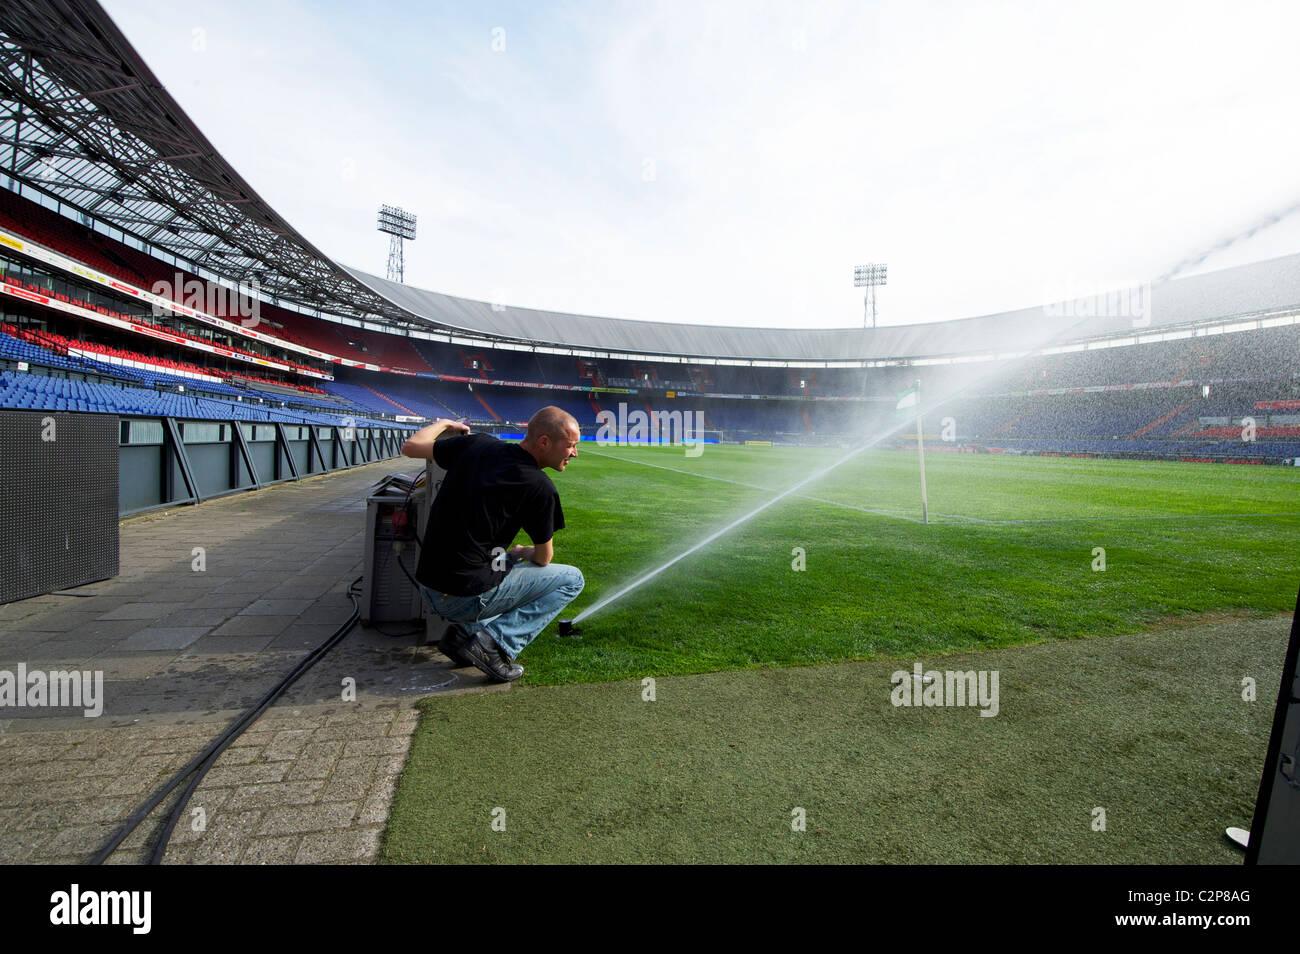 https www alamy com stock photo holland rotterdam groundsman at work at football stadium de kuip home 36139560 html